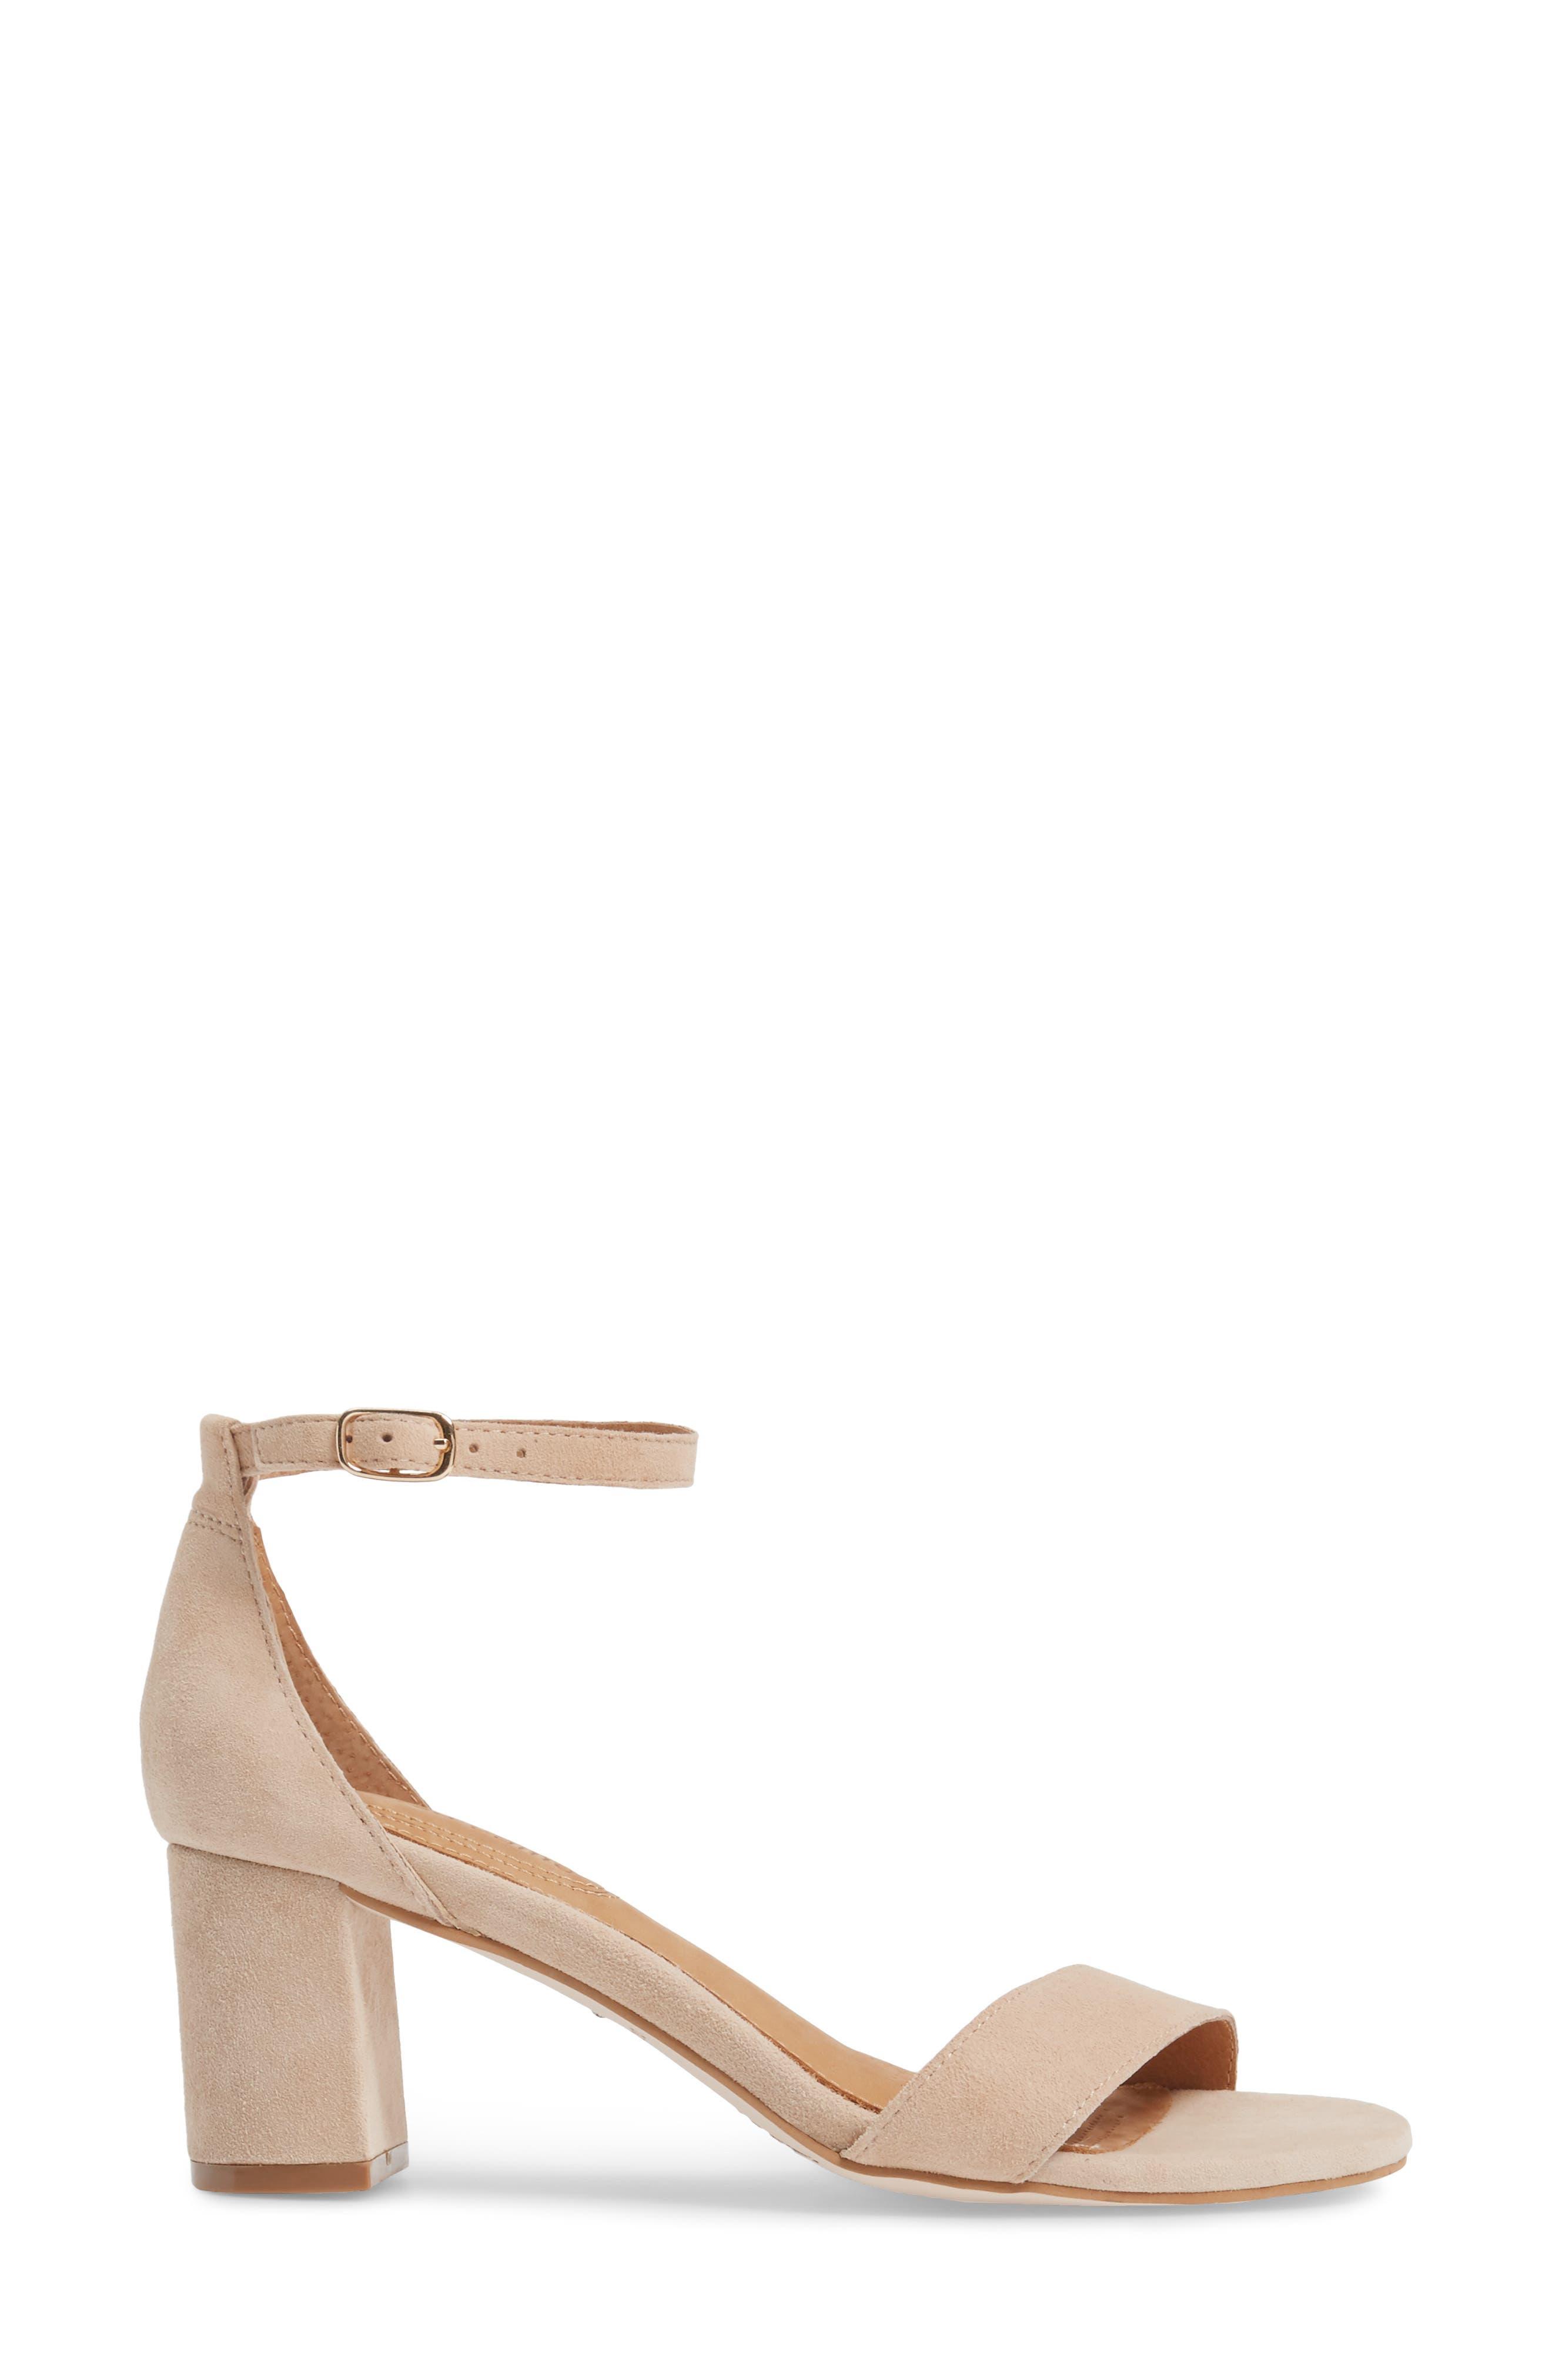 Alternate Image 3  - Corso Como Caress Sandal (Women)